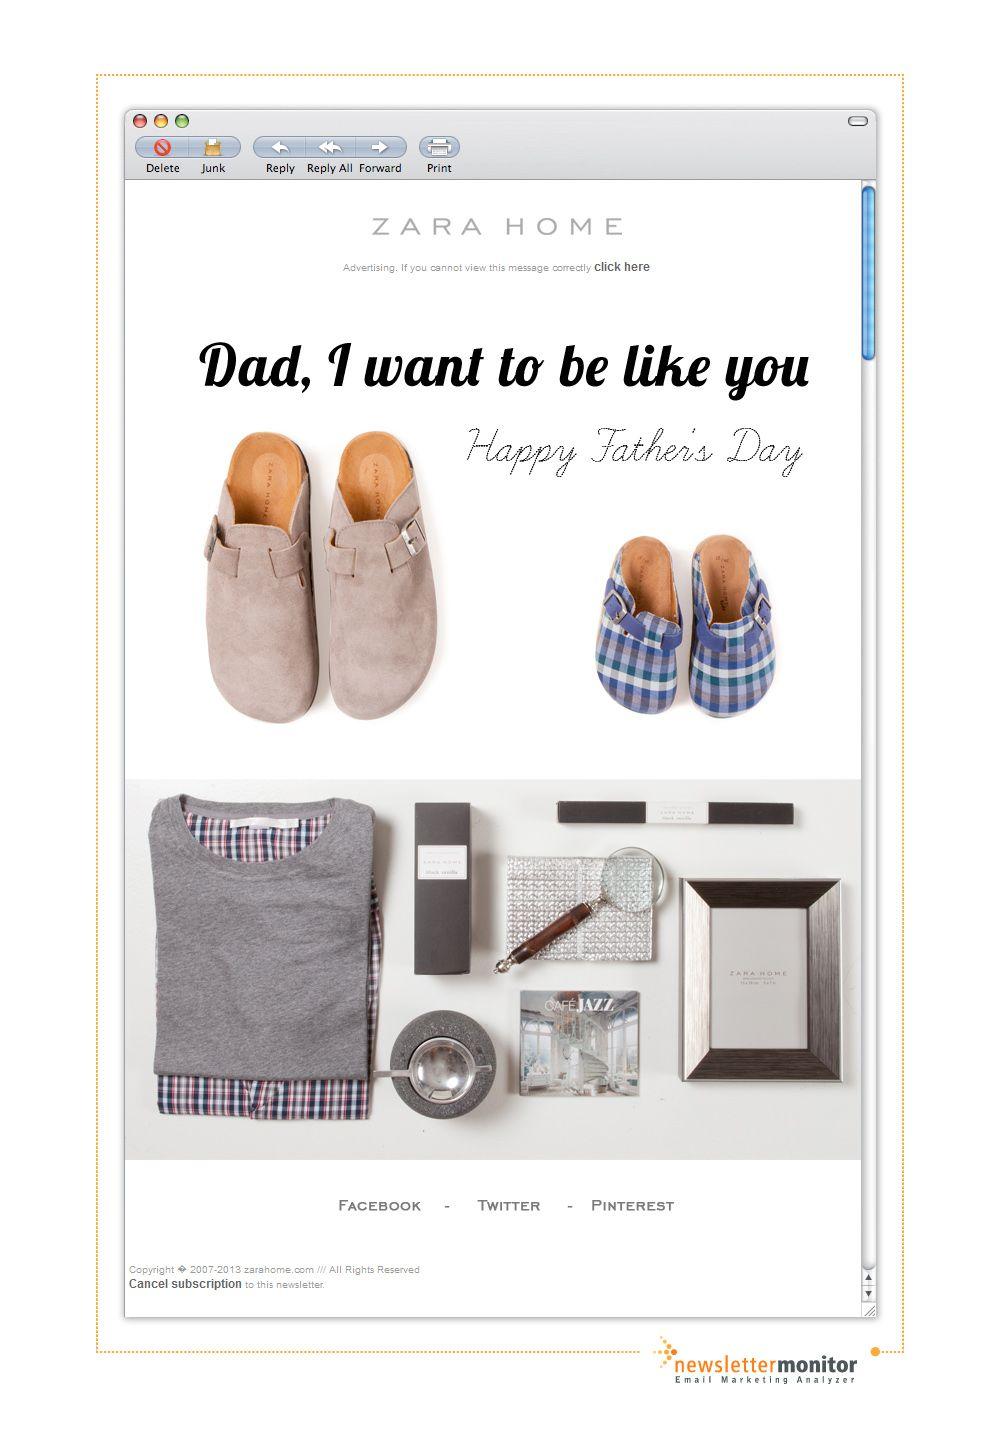 Brand: Zara Home | Subject: Happy Father's Day!